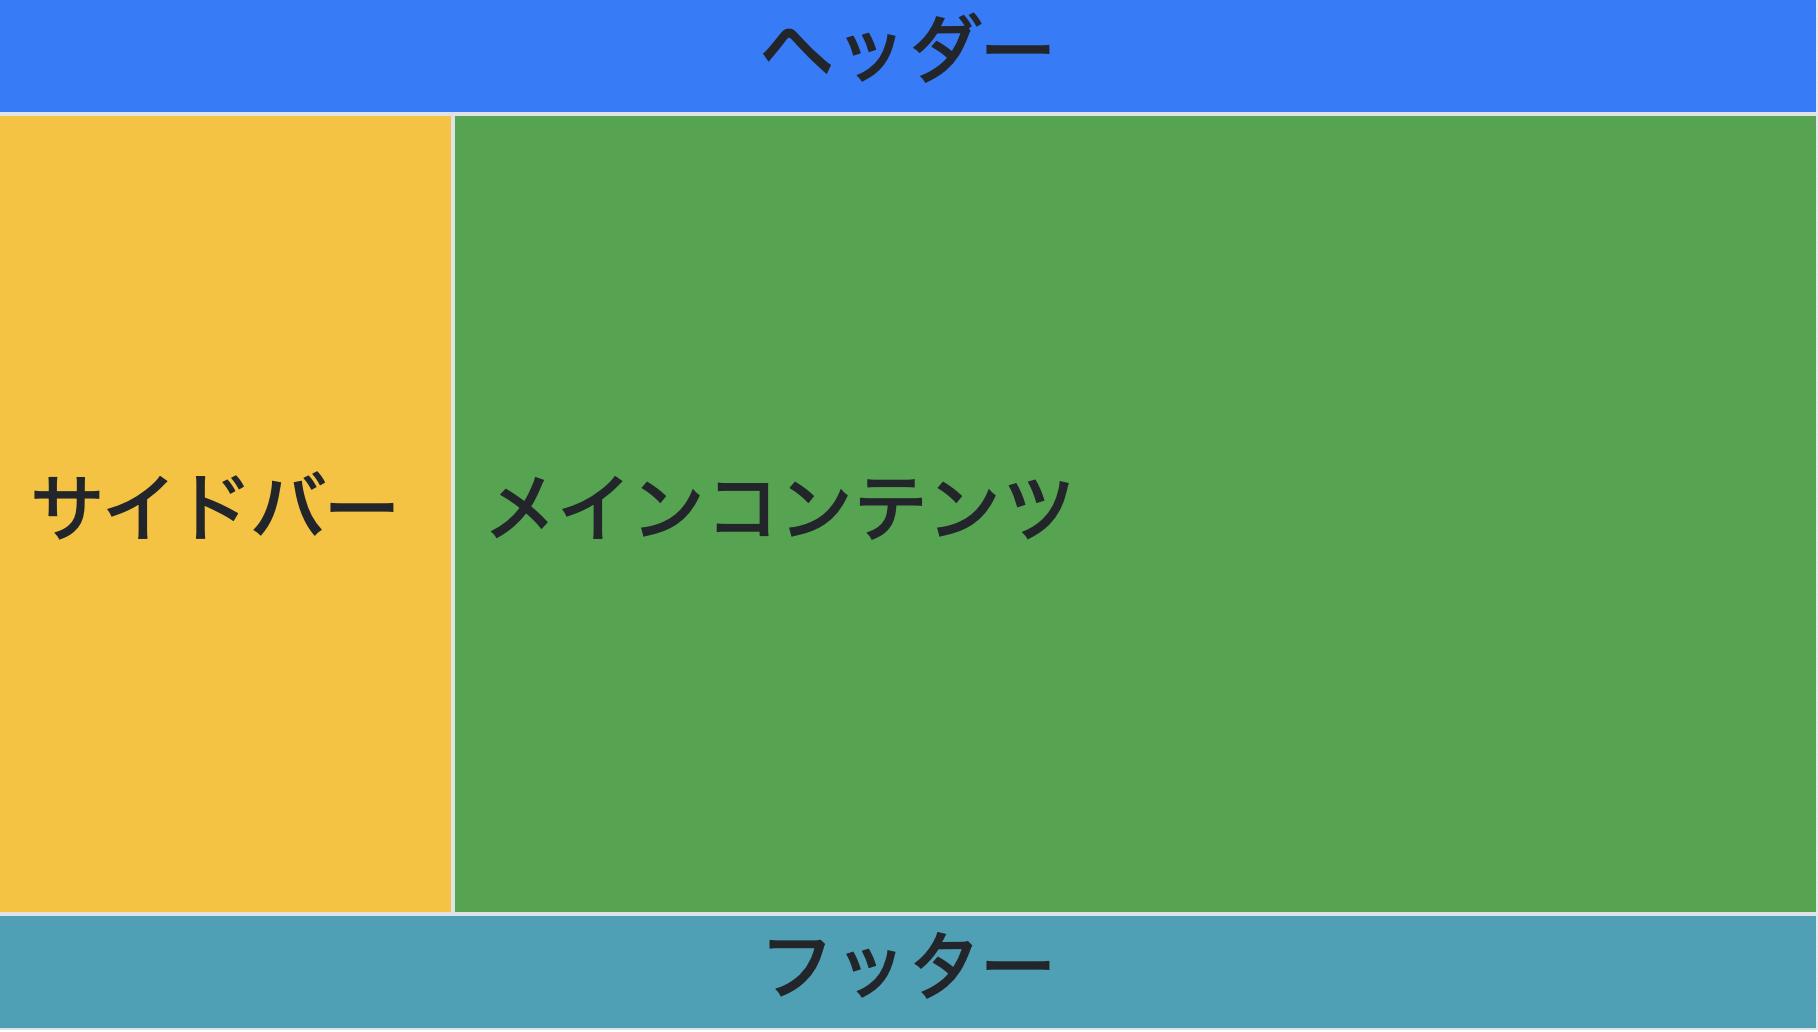 f:id:trial-and-error:20210508215110p:plain